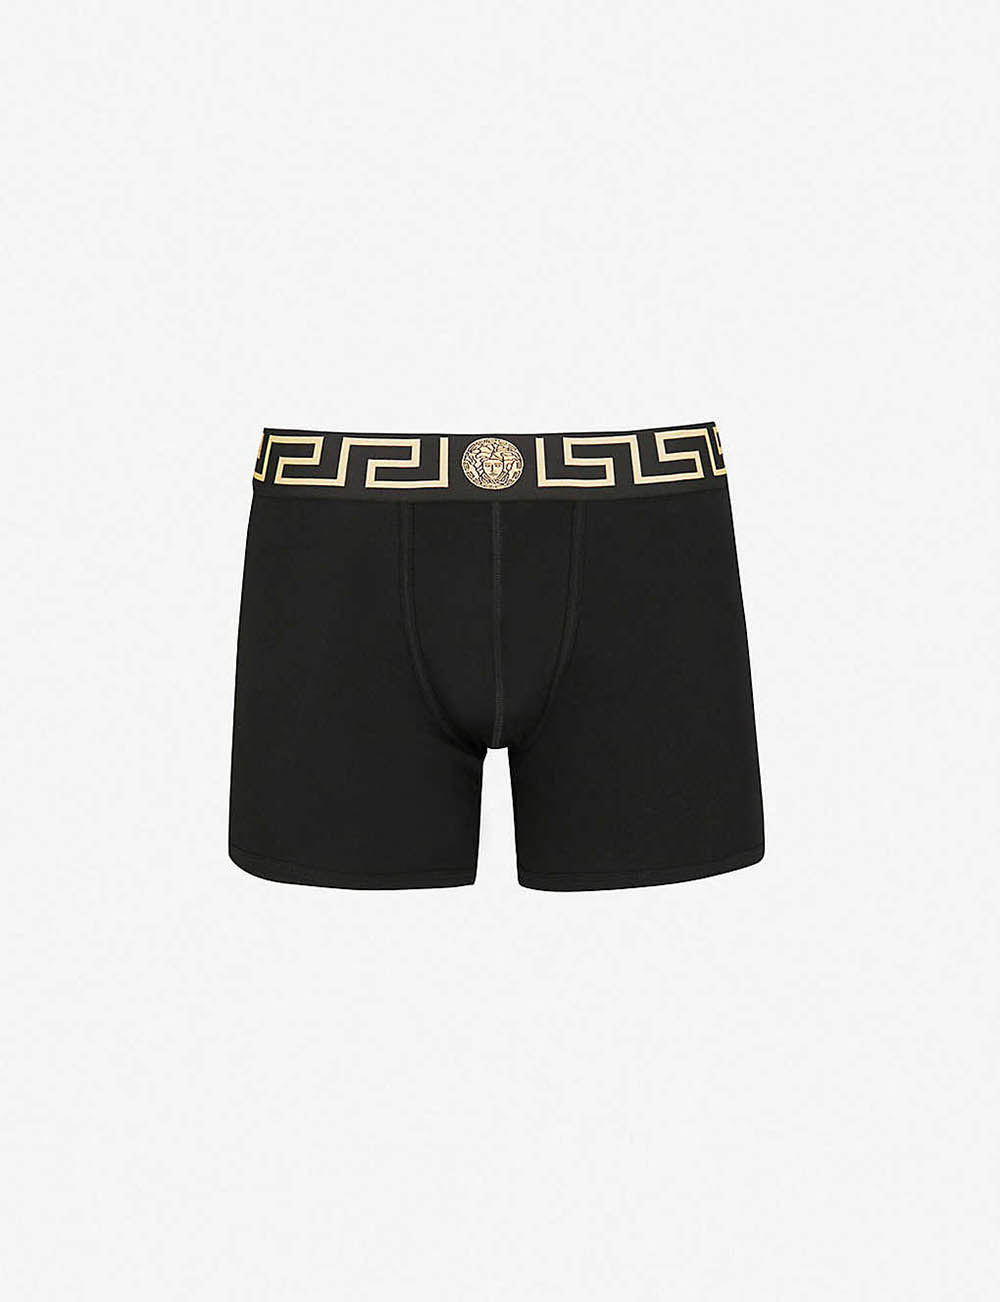 wedding boxer underwear pants grooms